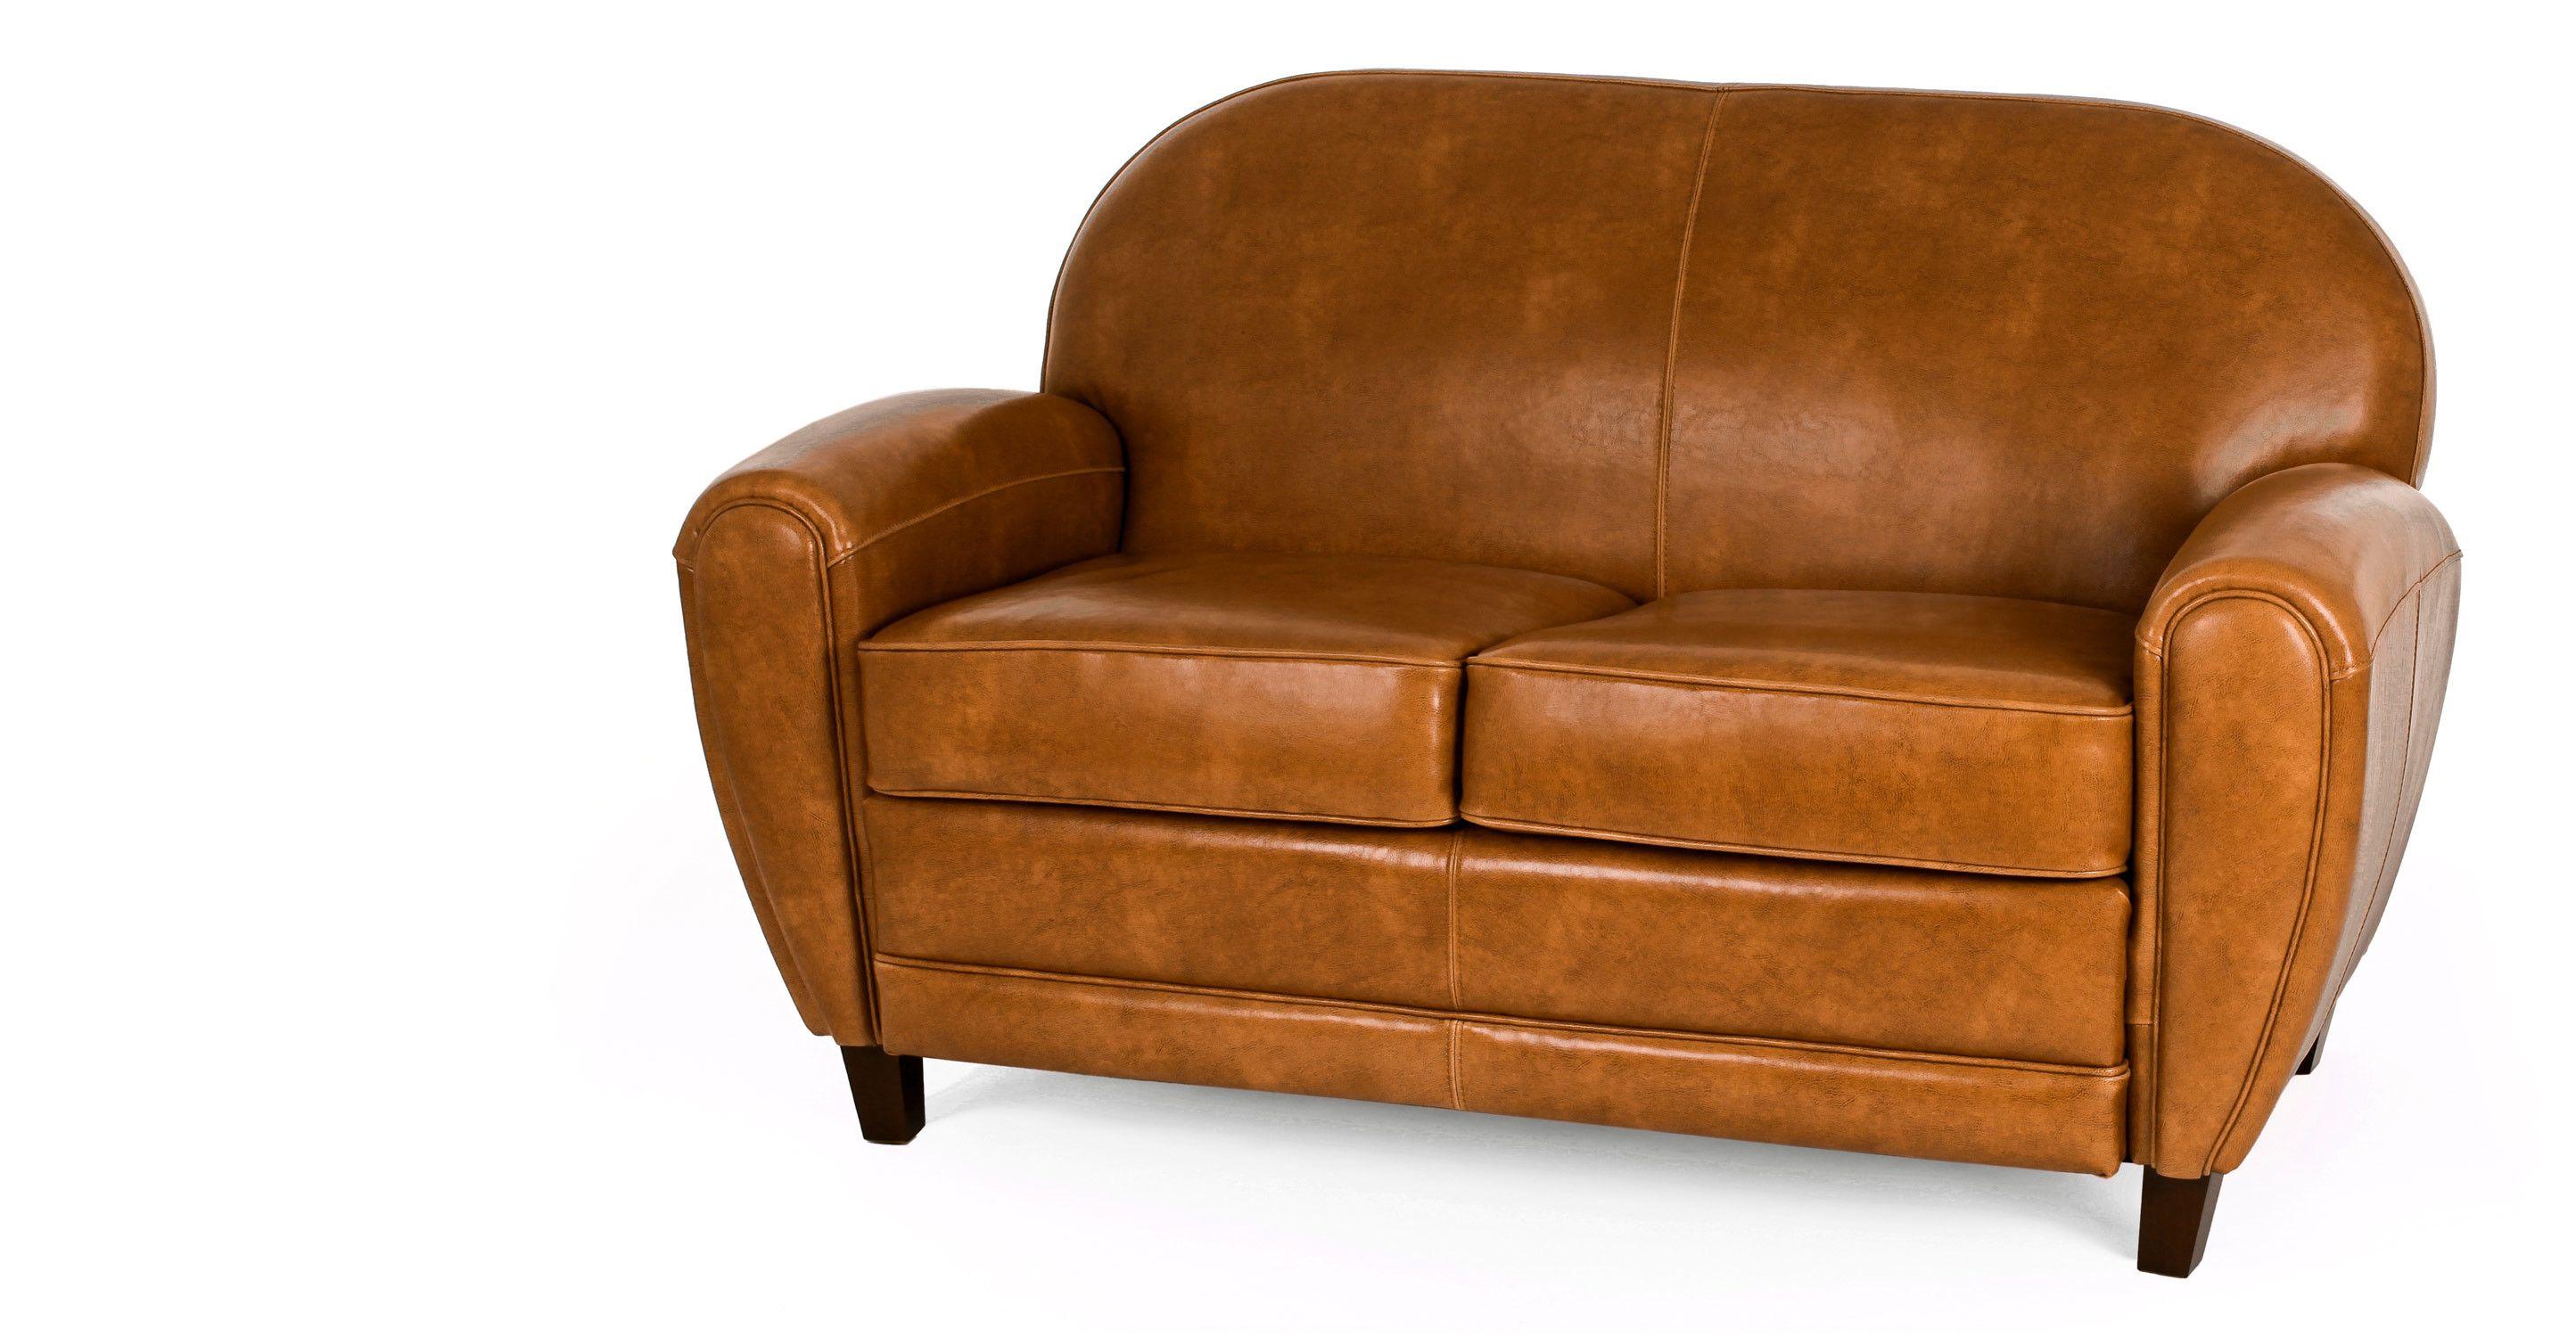 Wonderful Jazz Club 2 Seater Sofa, Cognac